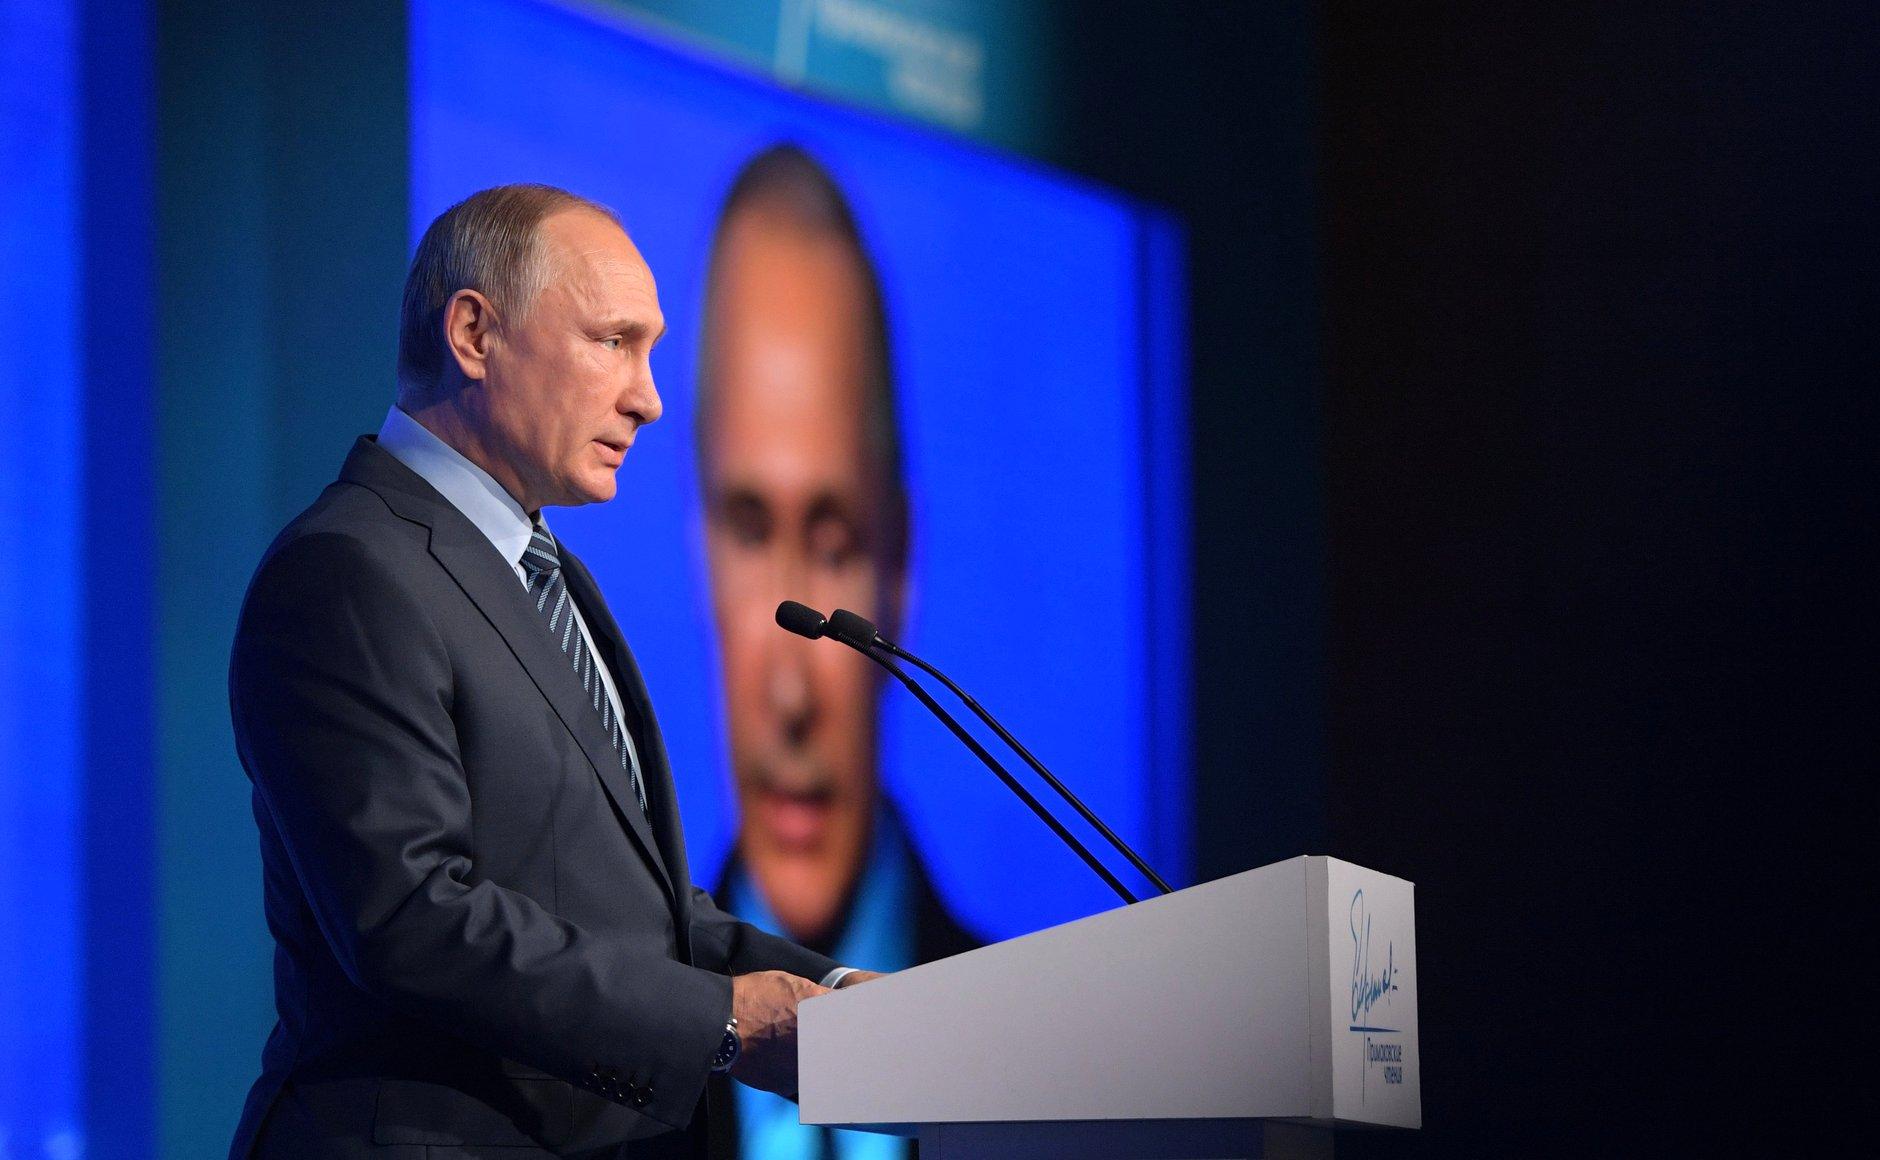 Presiden Putin menegaskan bahawa Rusia berkomitmen untuk membangun sebuah sistem hubungan internasional yang stabil di abad ke-21.